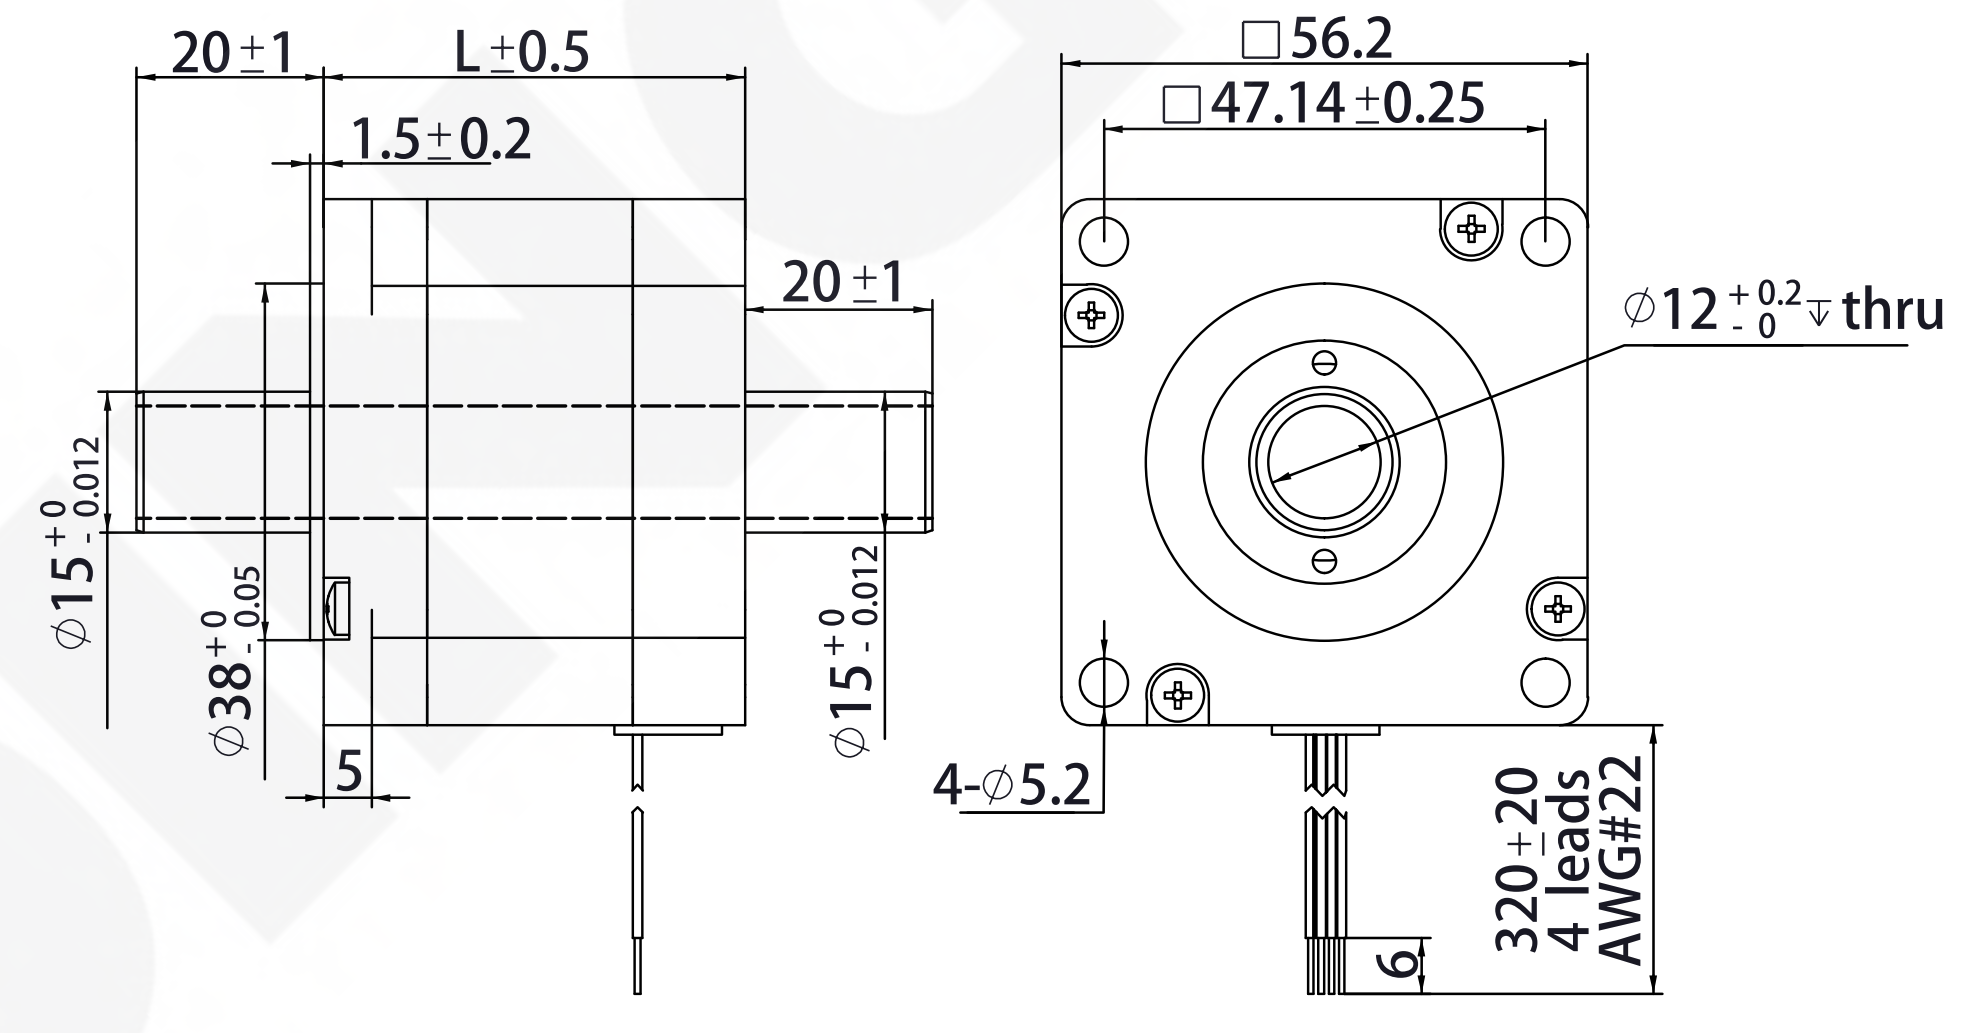 NEMA 23 Hollow Shaft Motor Drawing